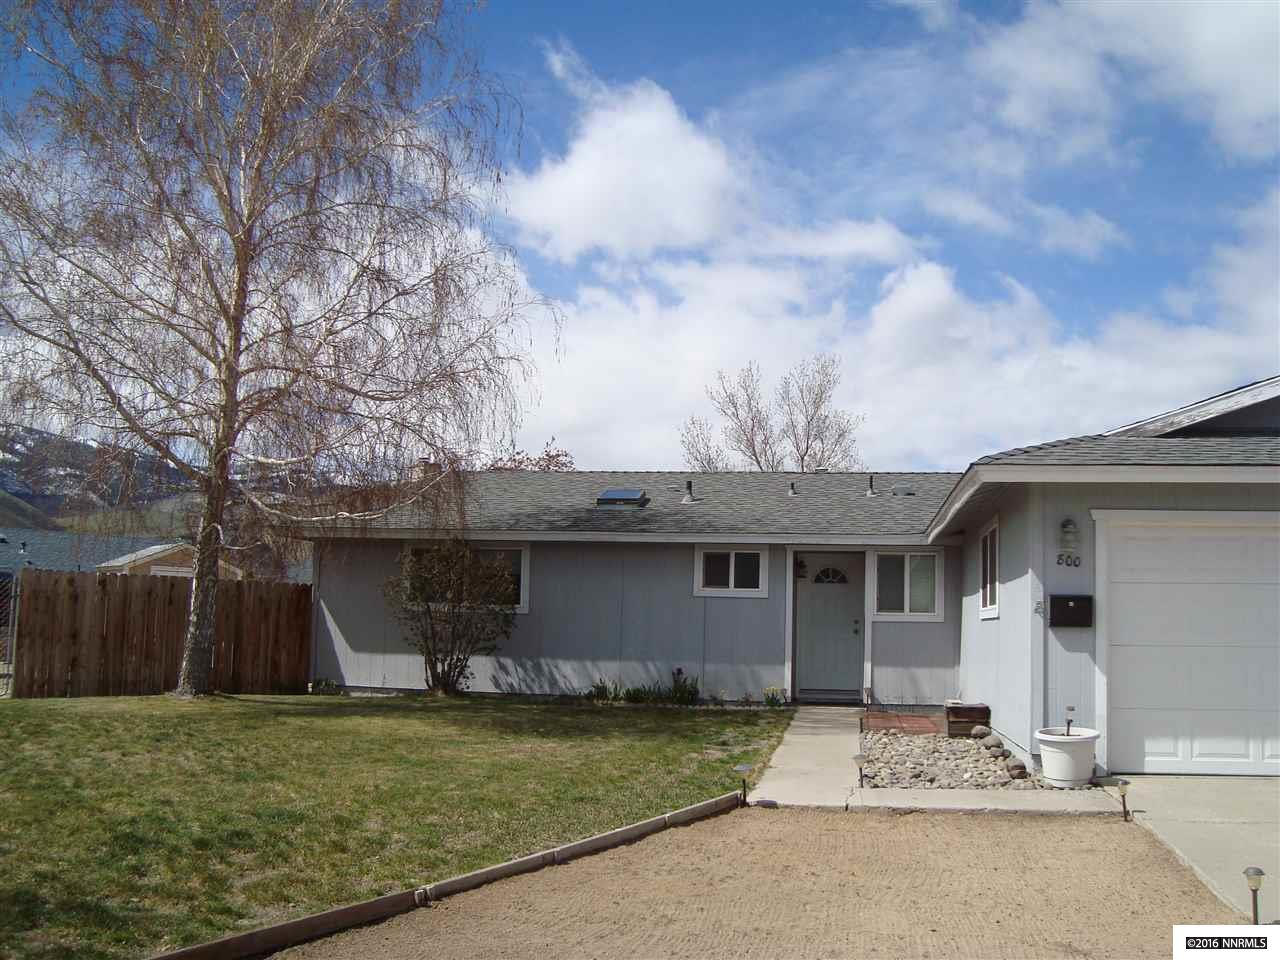 800 Armstrong Ln, Carson City, NV